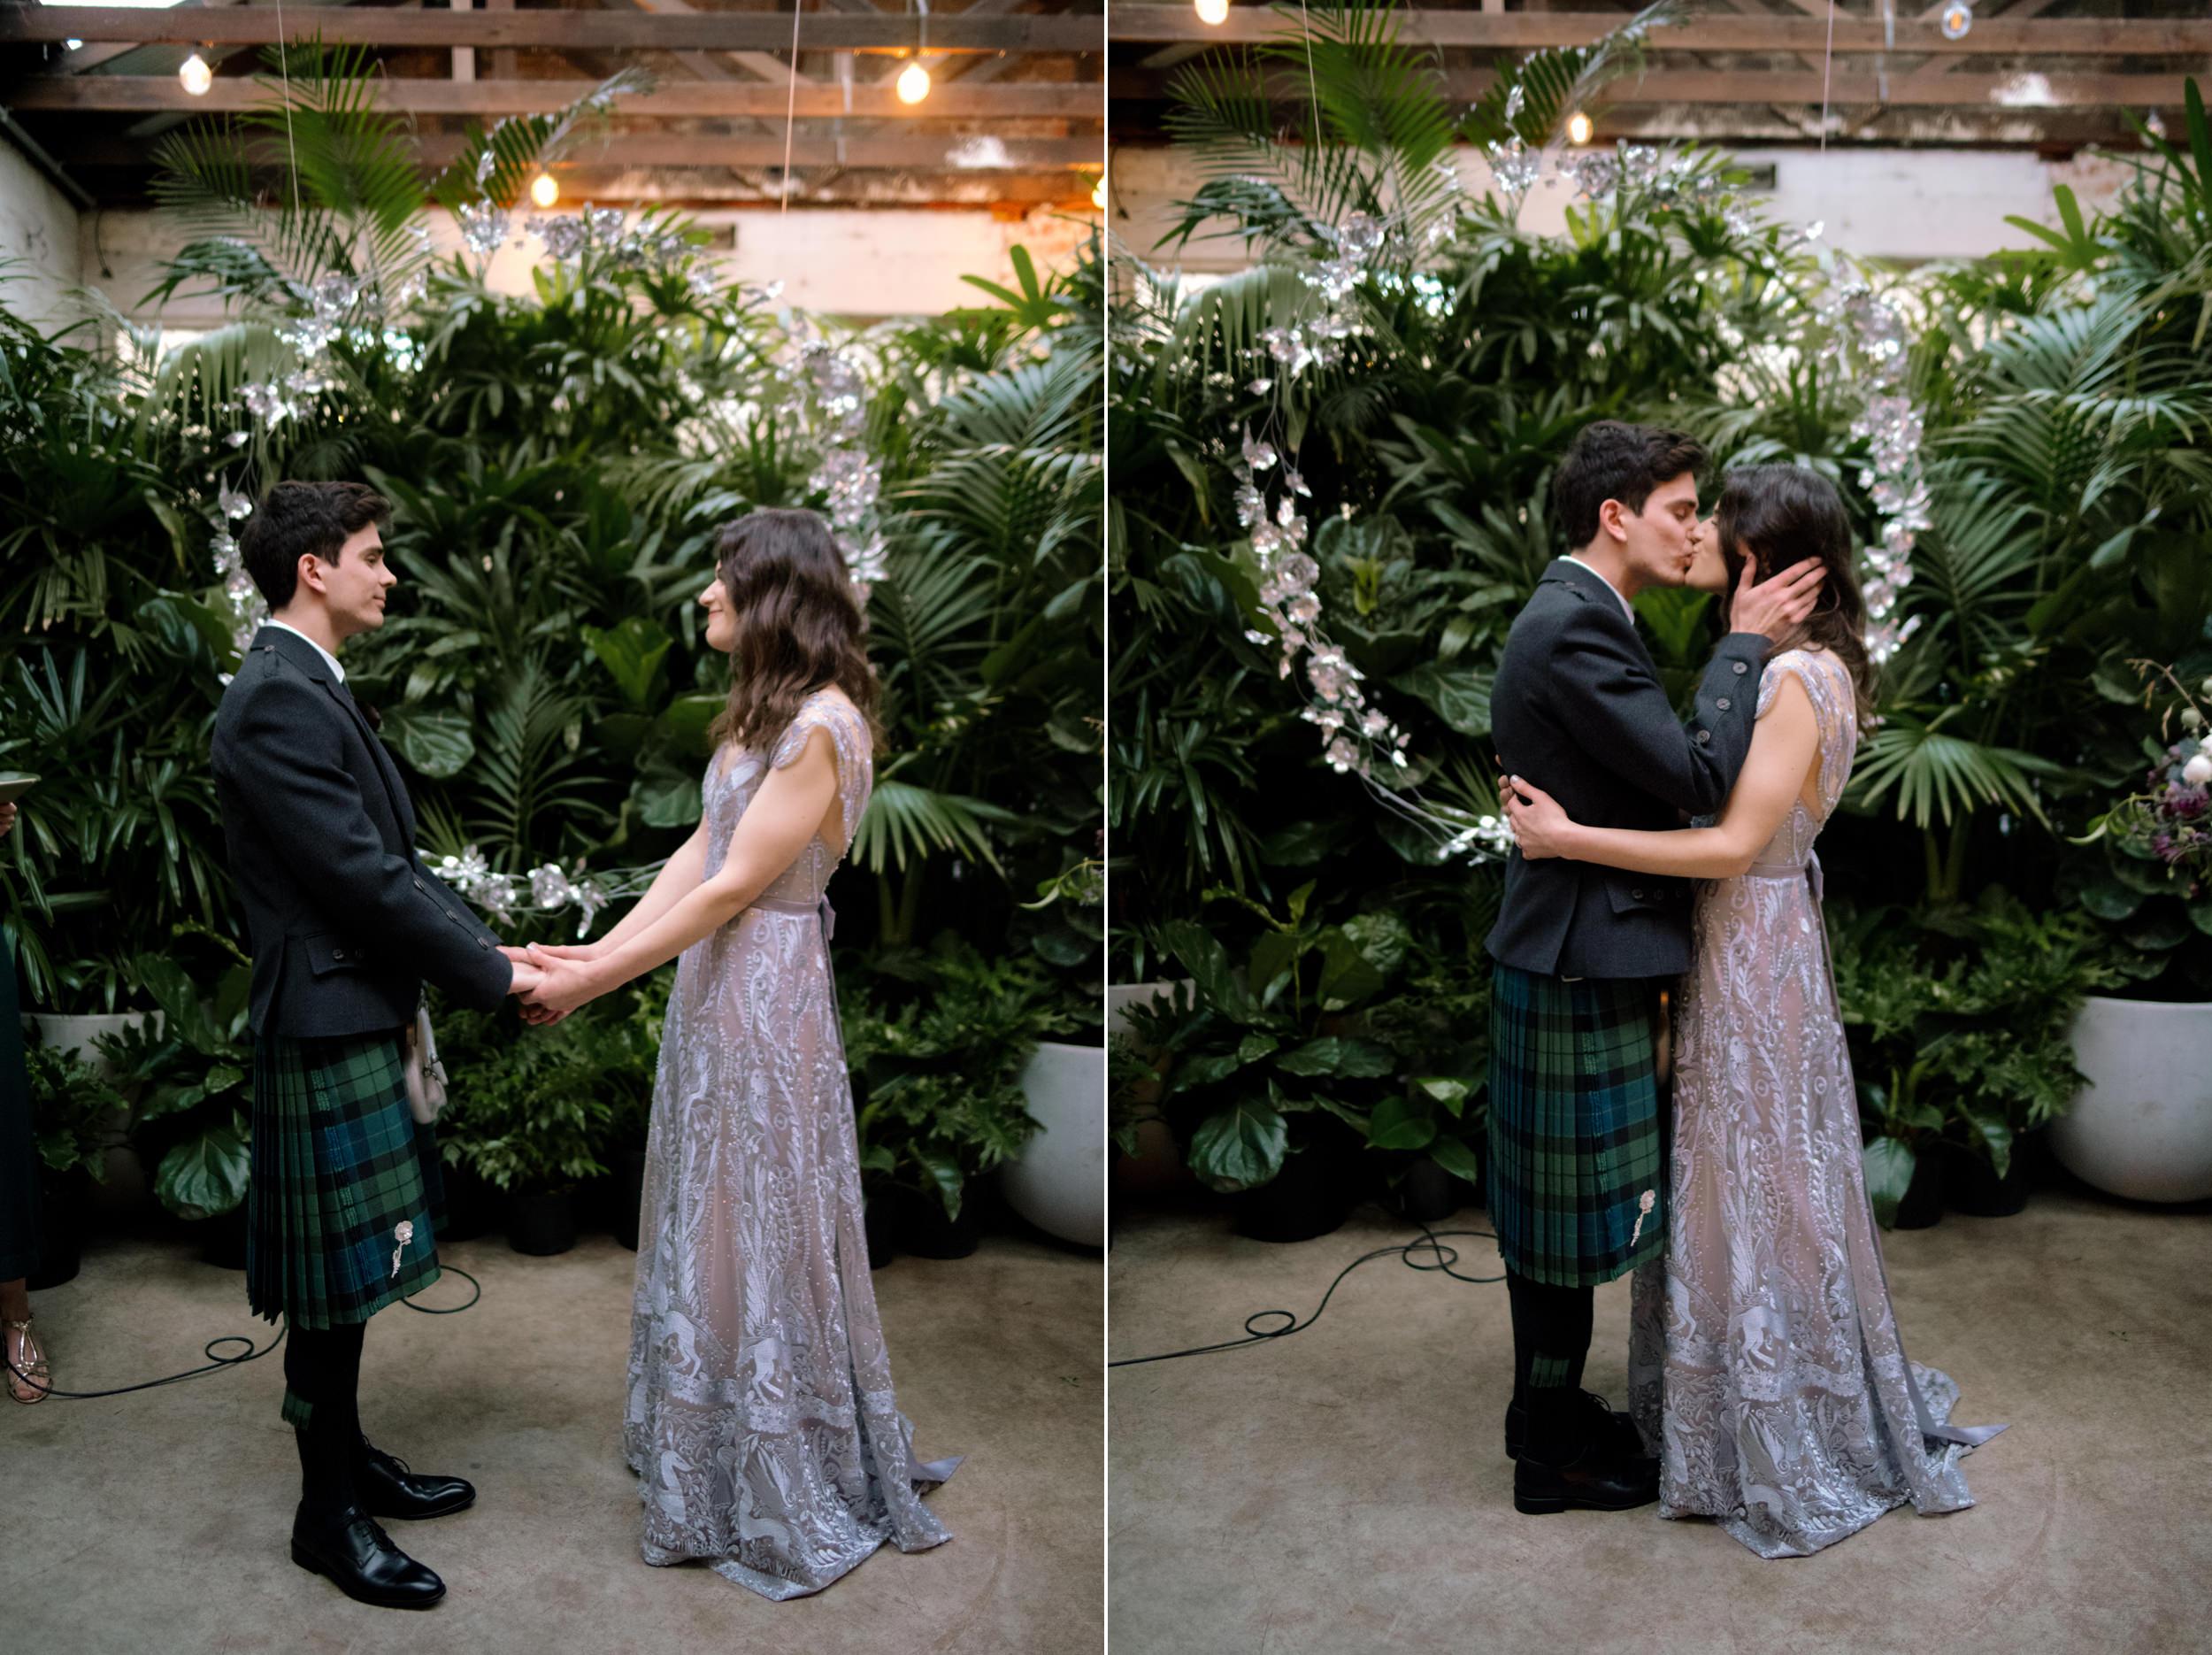 I-Got-You-Babe-&.Co.-Glasshaus-Wedding-Charlotte-Cameron0082.JPG